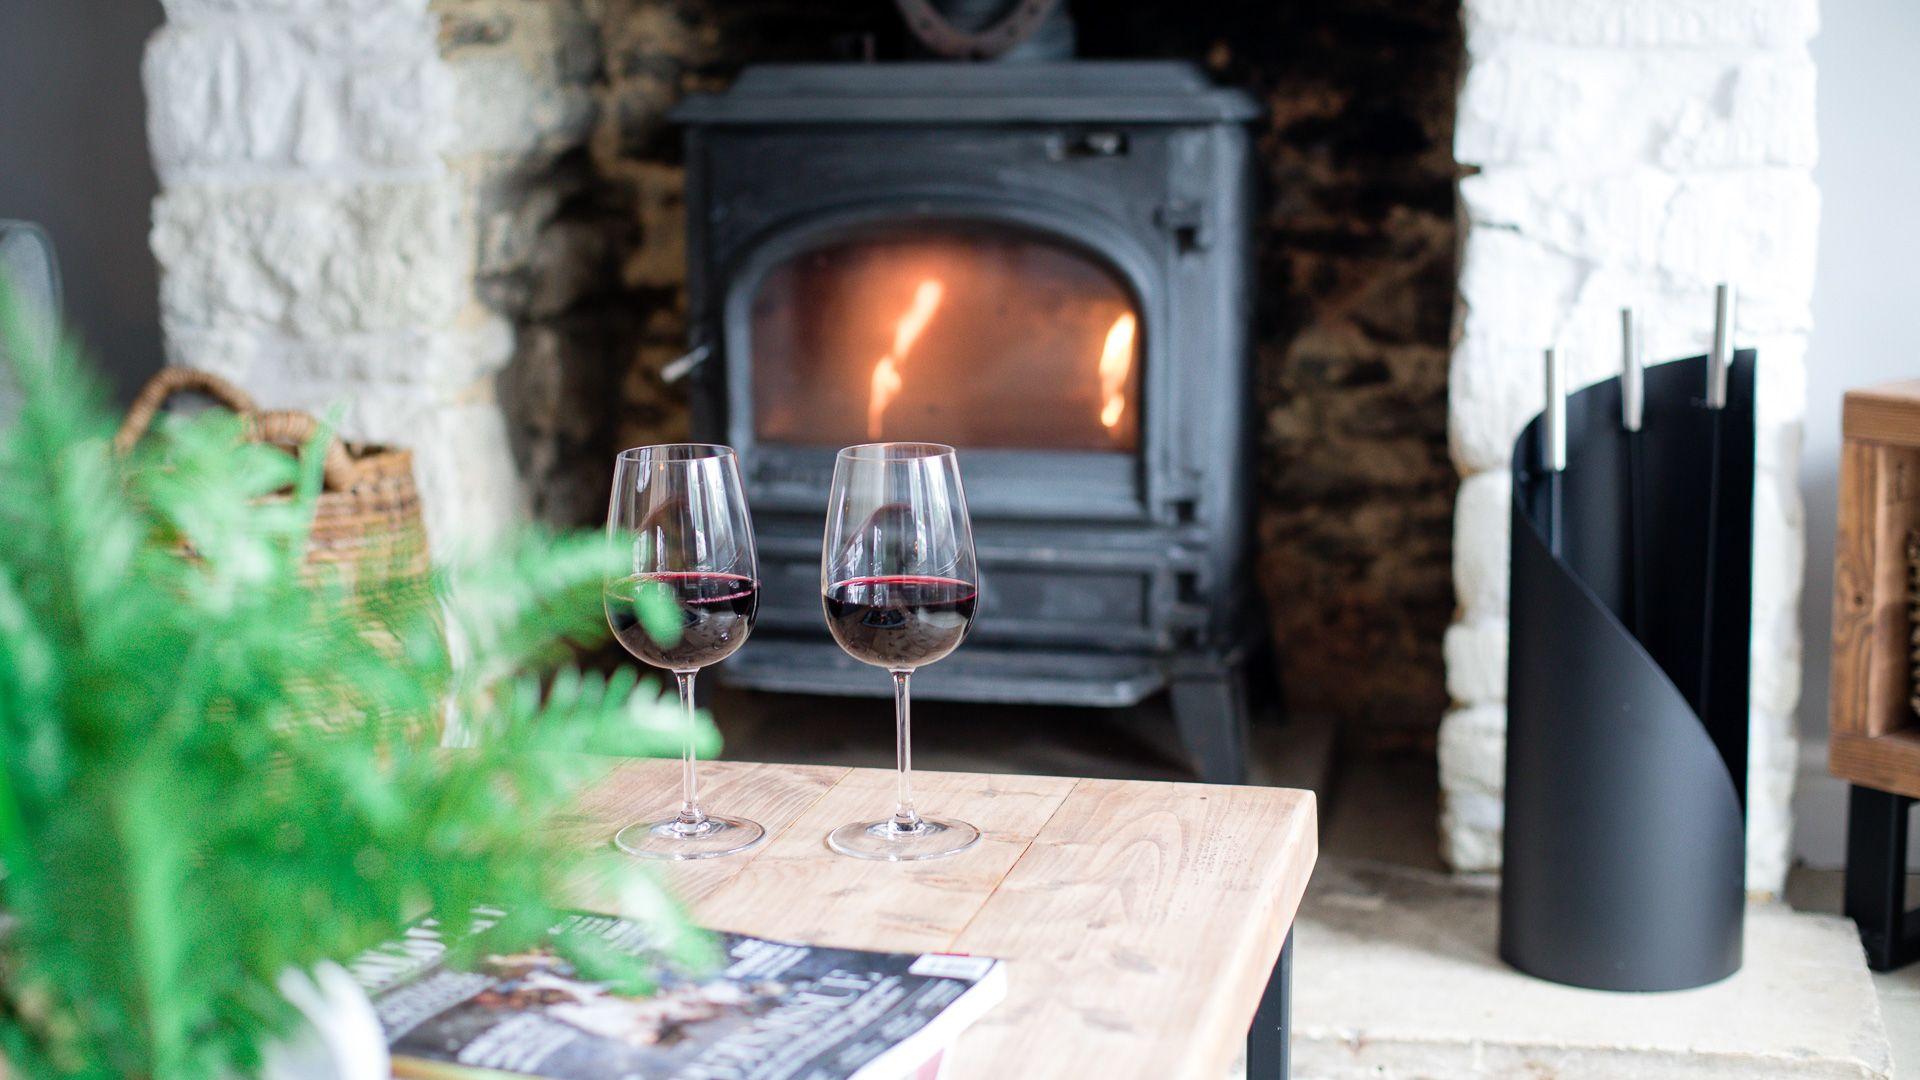 Woodburner scene, Hillside Cottage, Bolthole Retreats